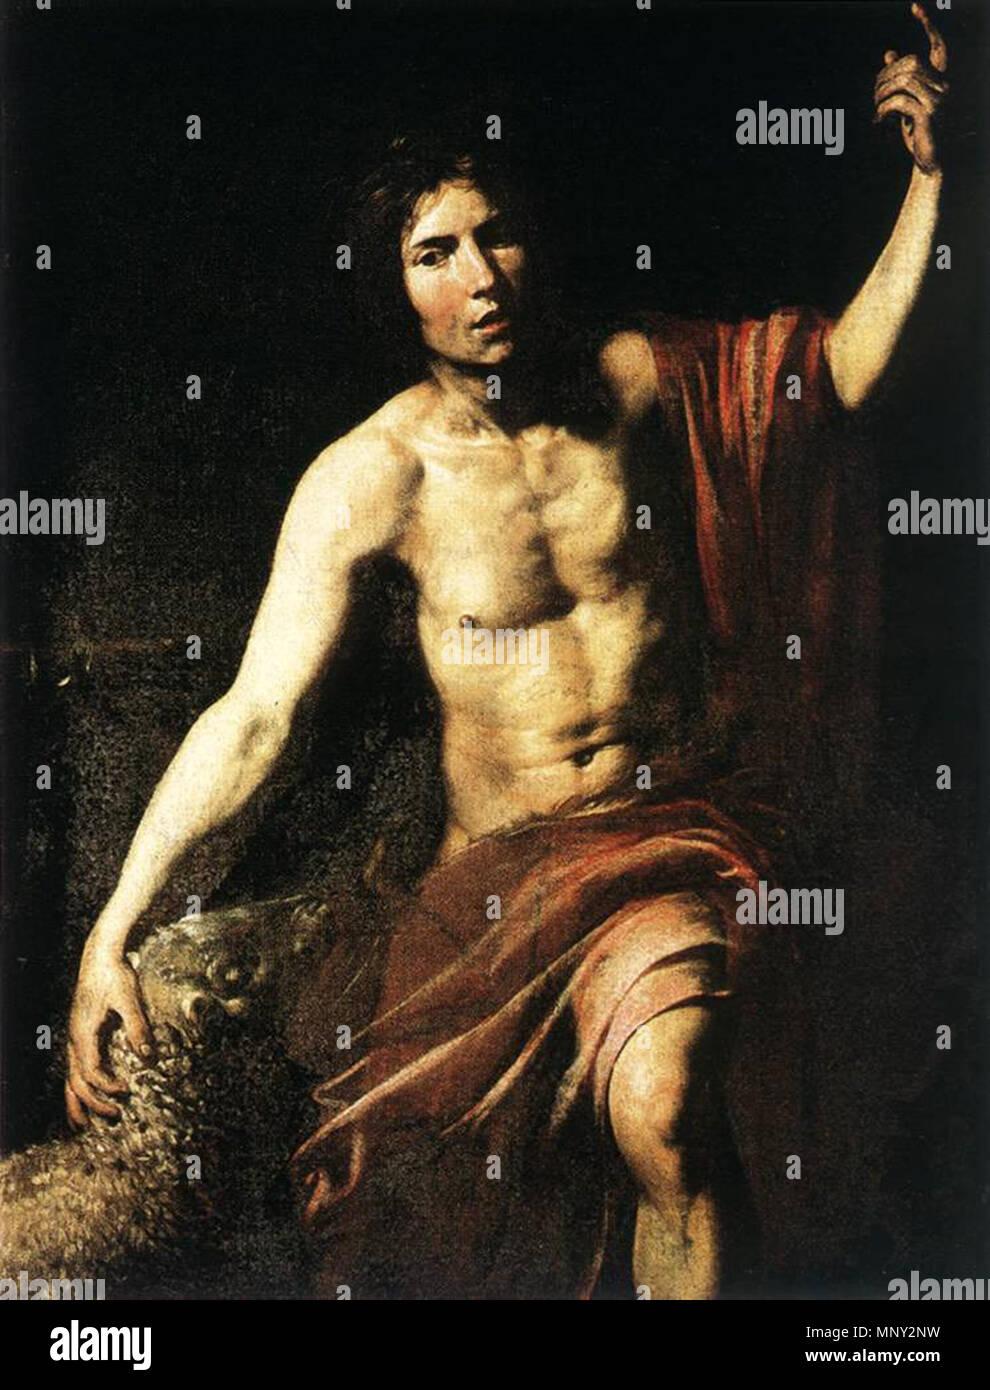 St John the Baptist   between 1628 and 1630.   1218 Valentin de Boulogne - St John the Baptist - WGA24250 - Stock Image